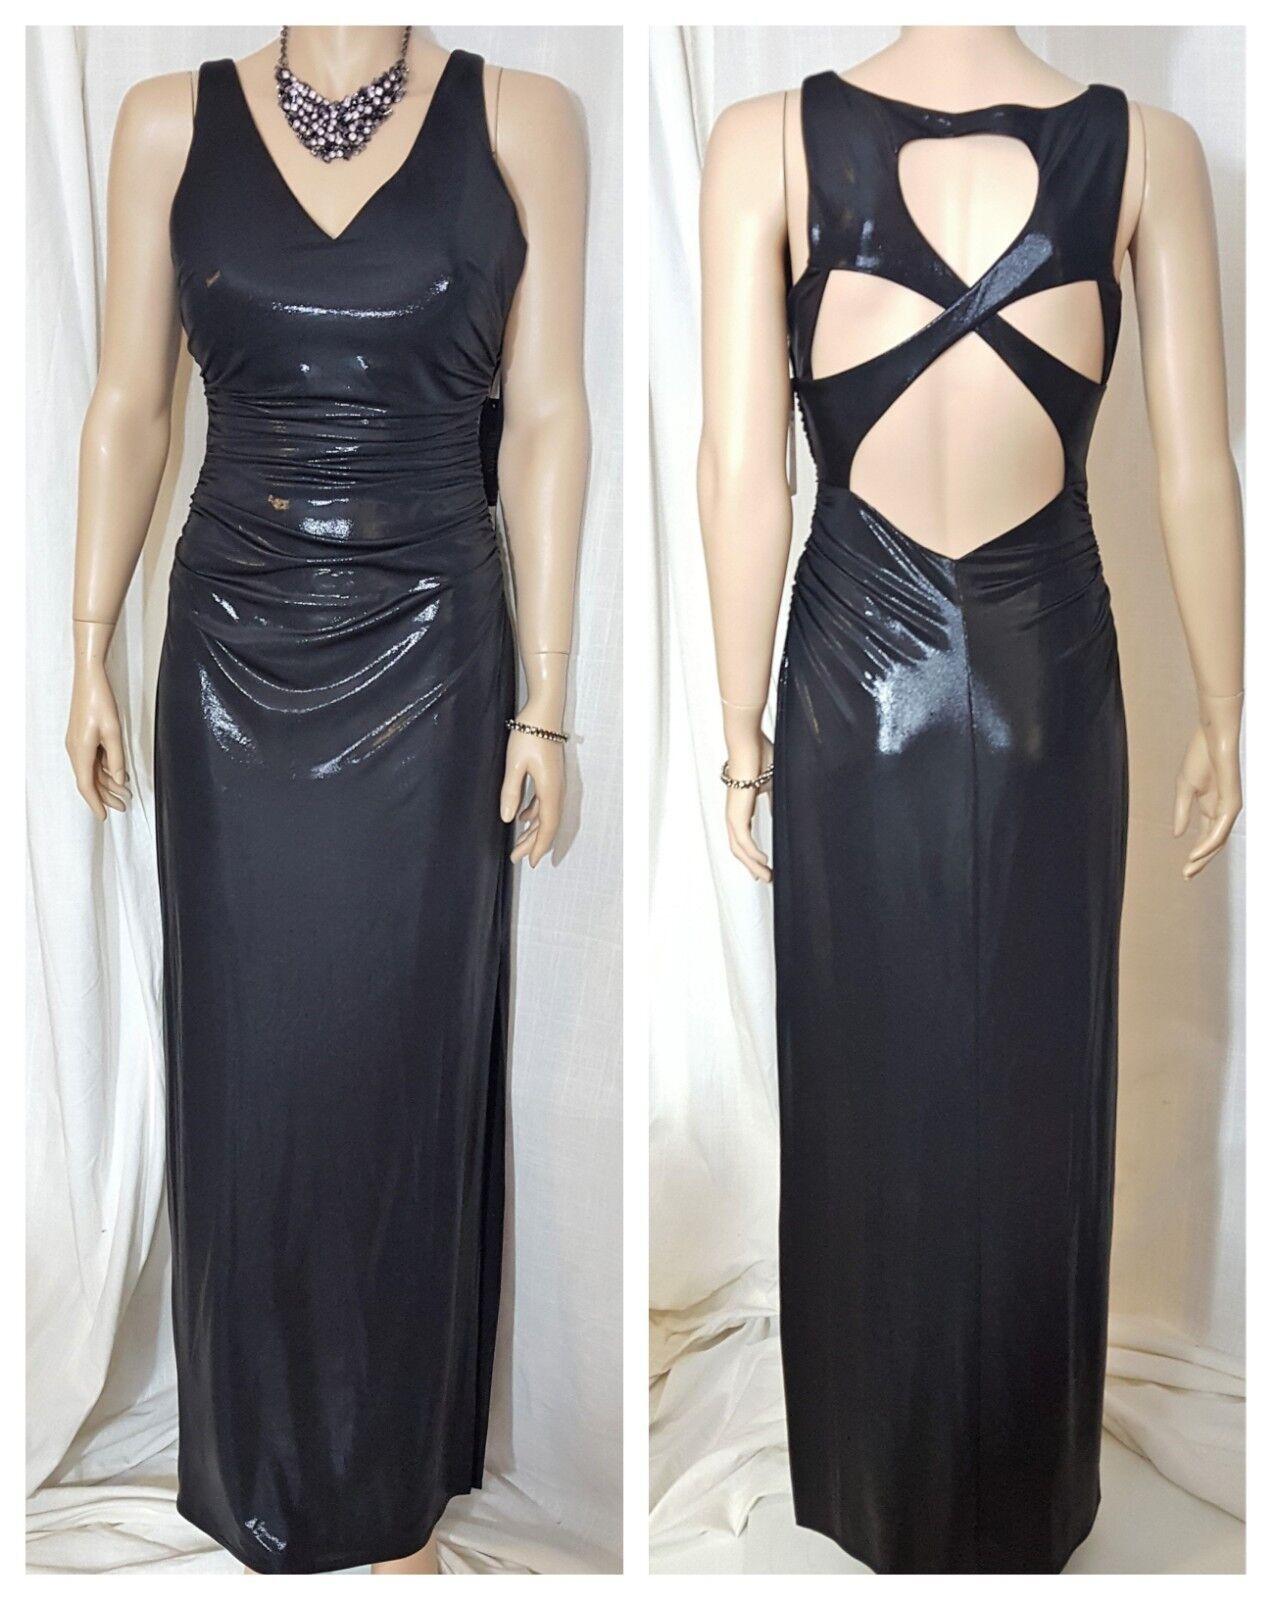 Laundry by Shelli Segal Metallic schwarz V Neck Cutout Dress Gown Sz. 6